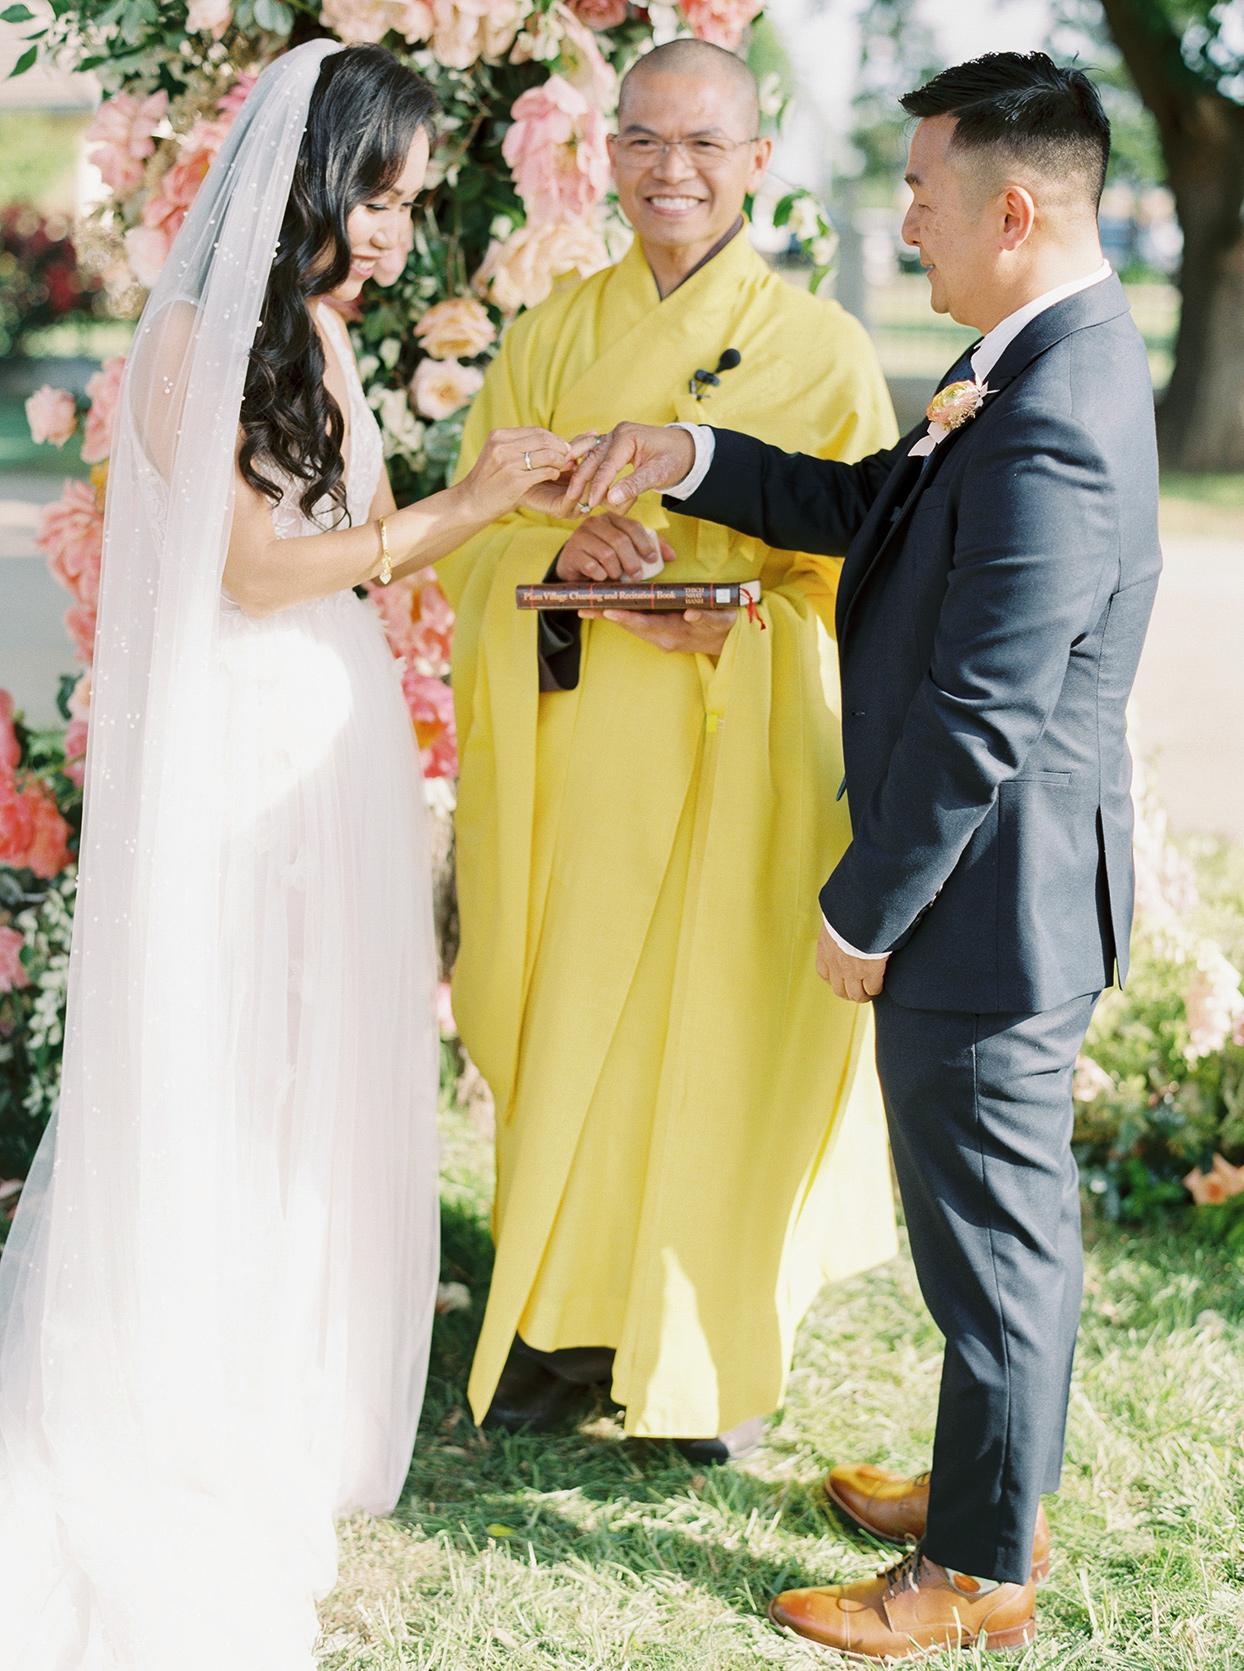 thuy kahn wedding ceremony ring exchange